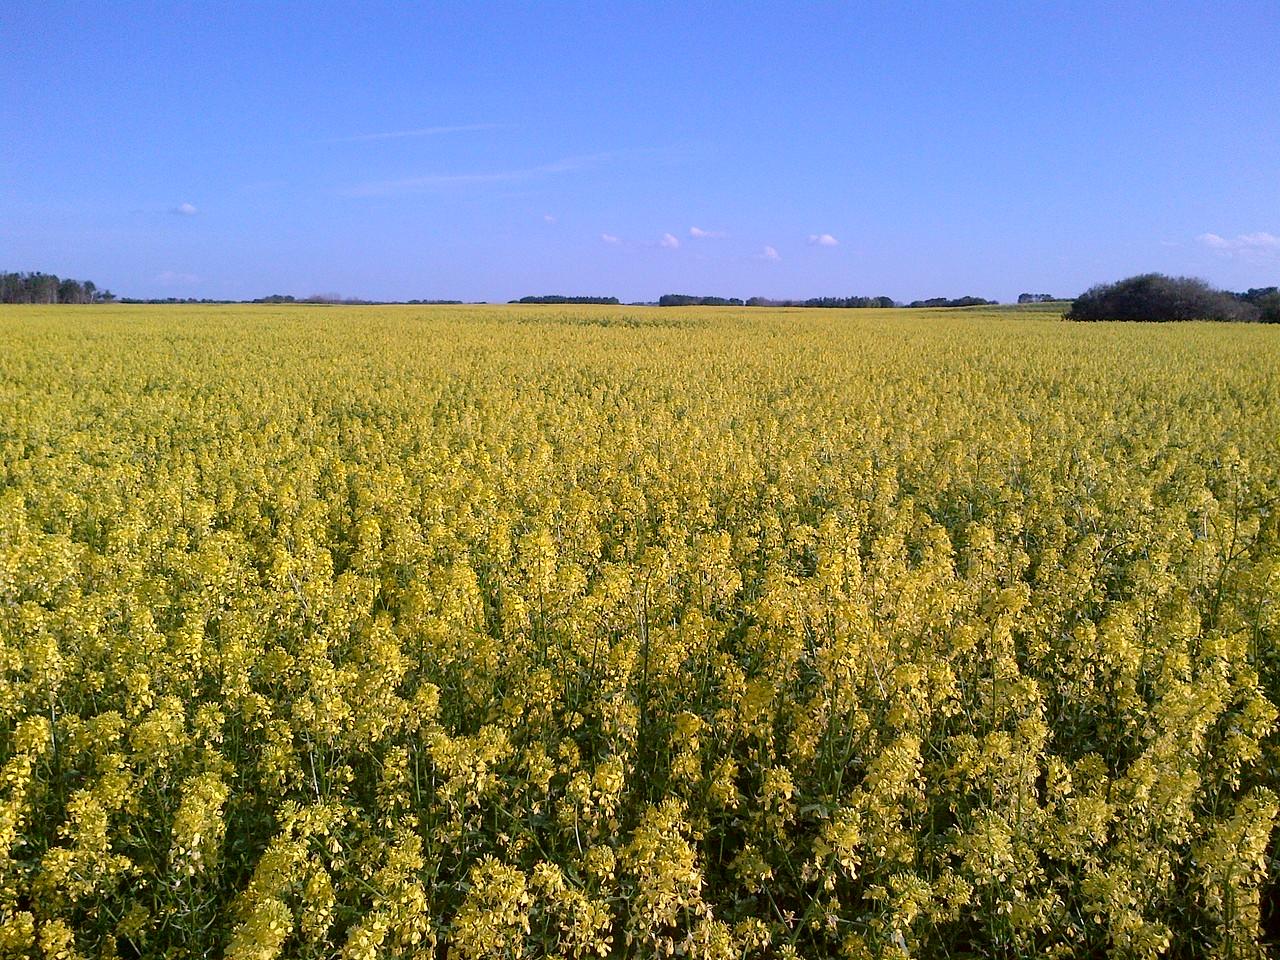 Mustard in Bloom